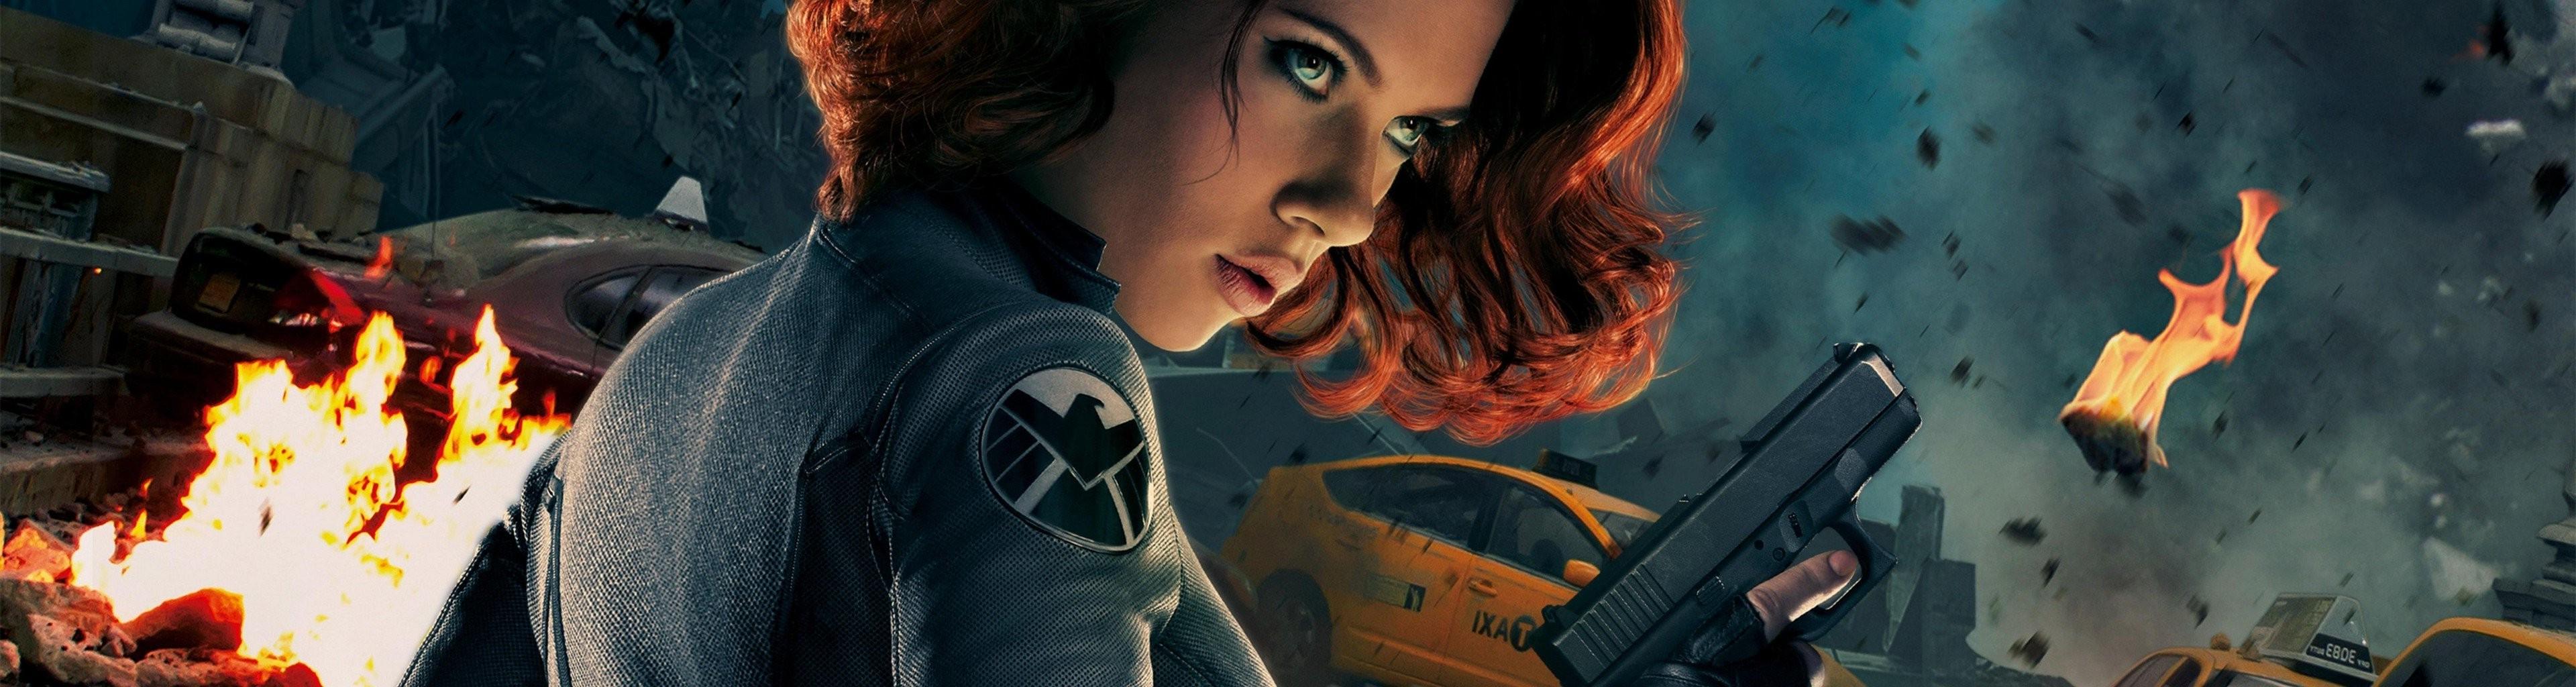 Wallpaper : 3840x1024 px, Black Widow, Scarlett Johansson